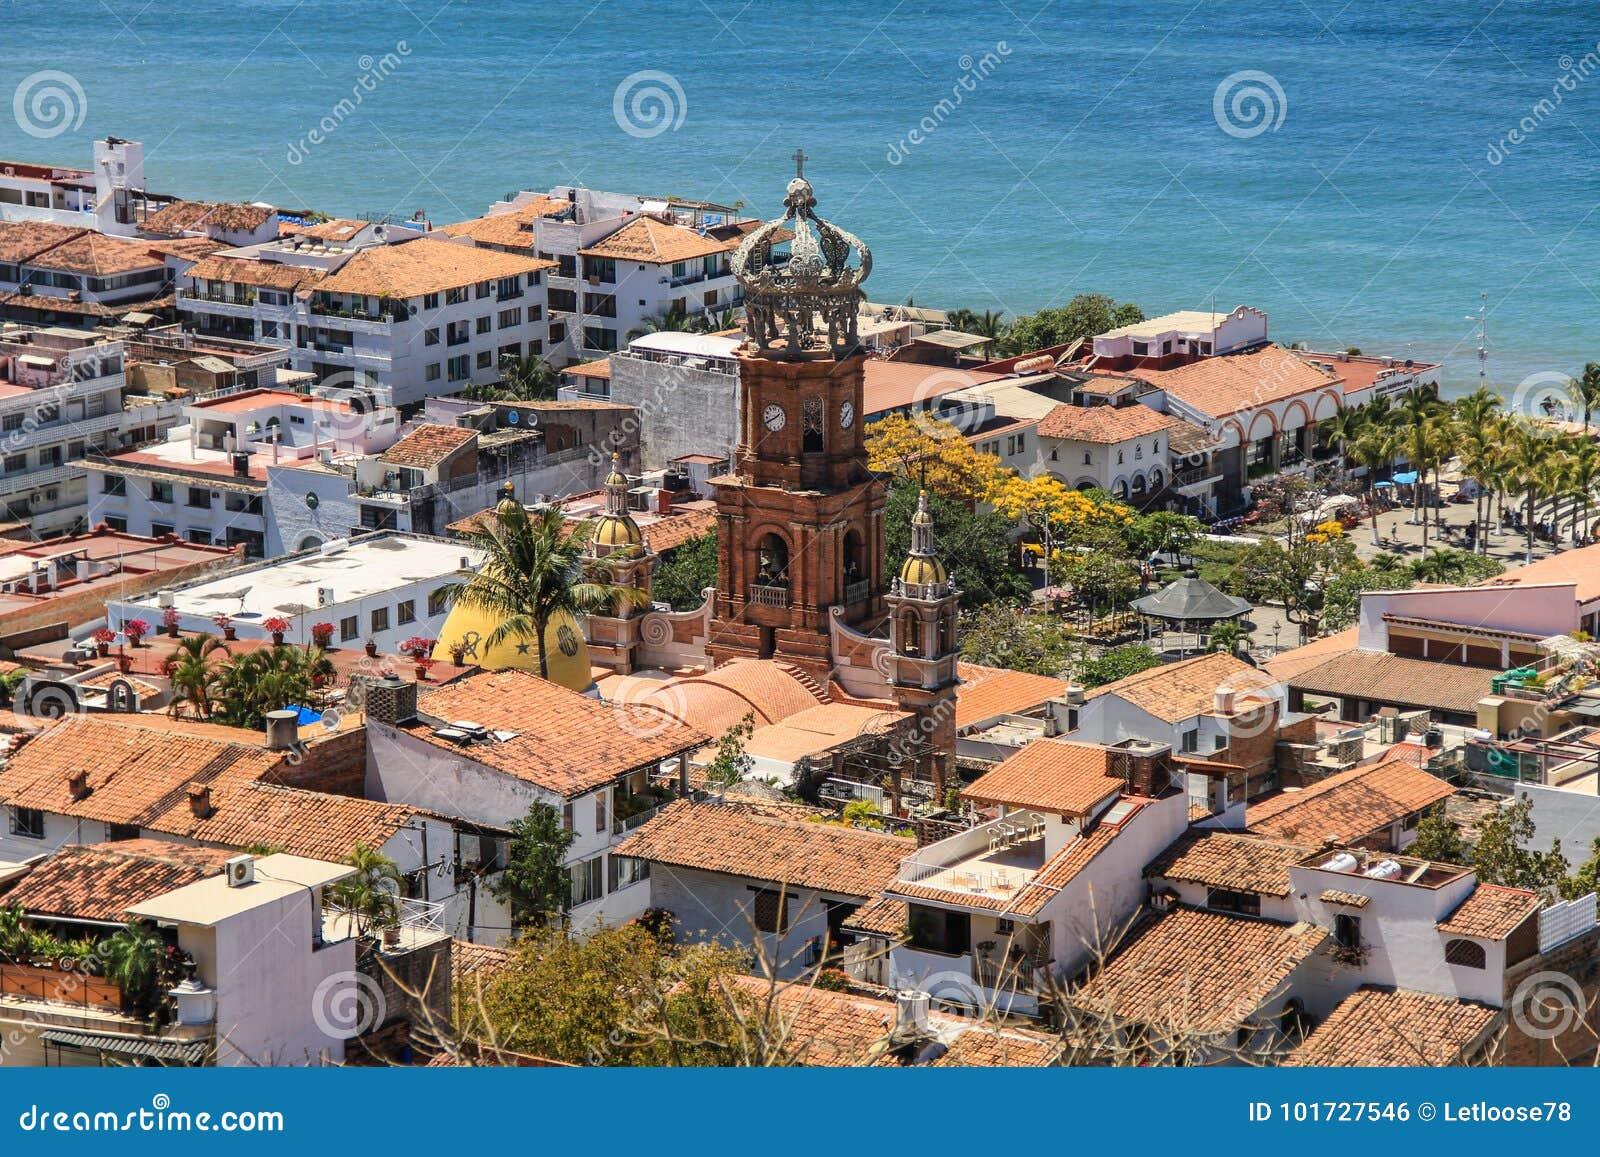 Puerto Vallarta i Nuestra Señora de Guadalupe kościół od wzgórzy above, Puerto Vallarta, Jalisco, Meksyk